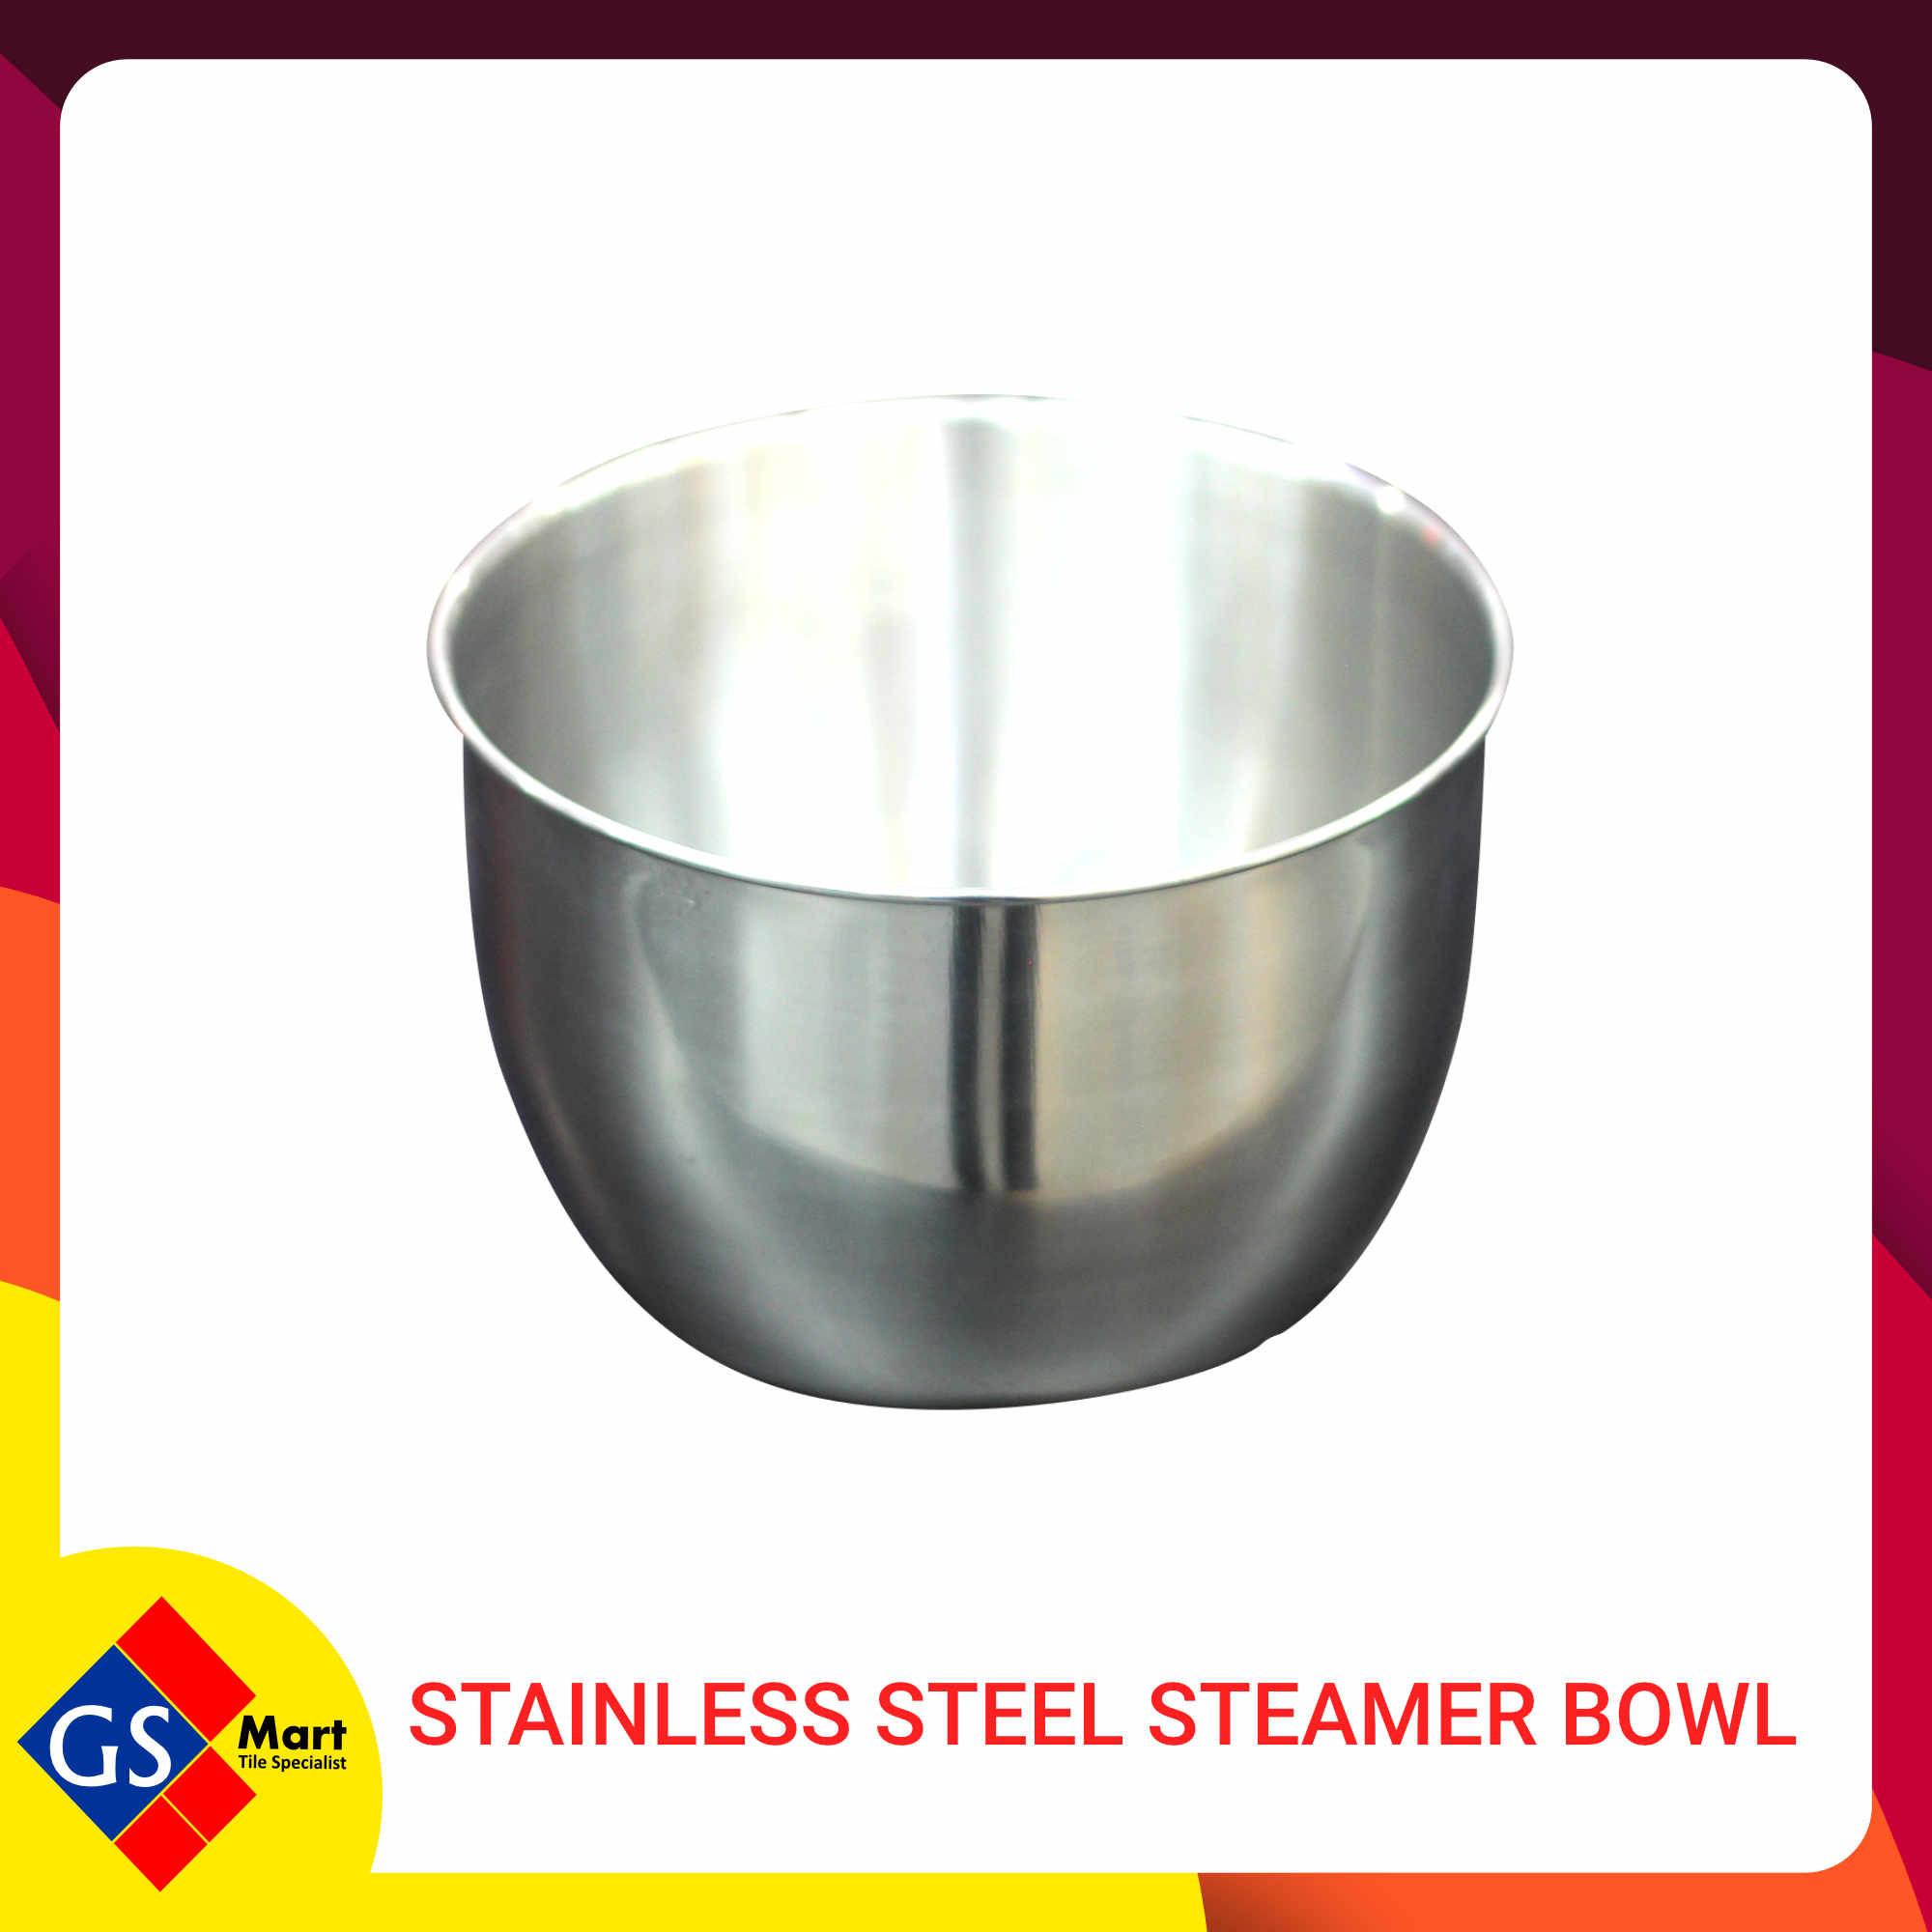 STAINLESS STEEL STEAMER BOWL